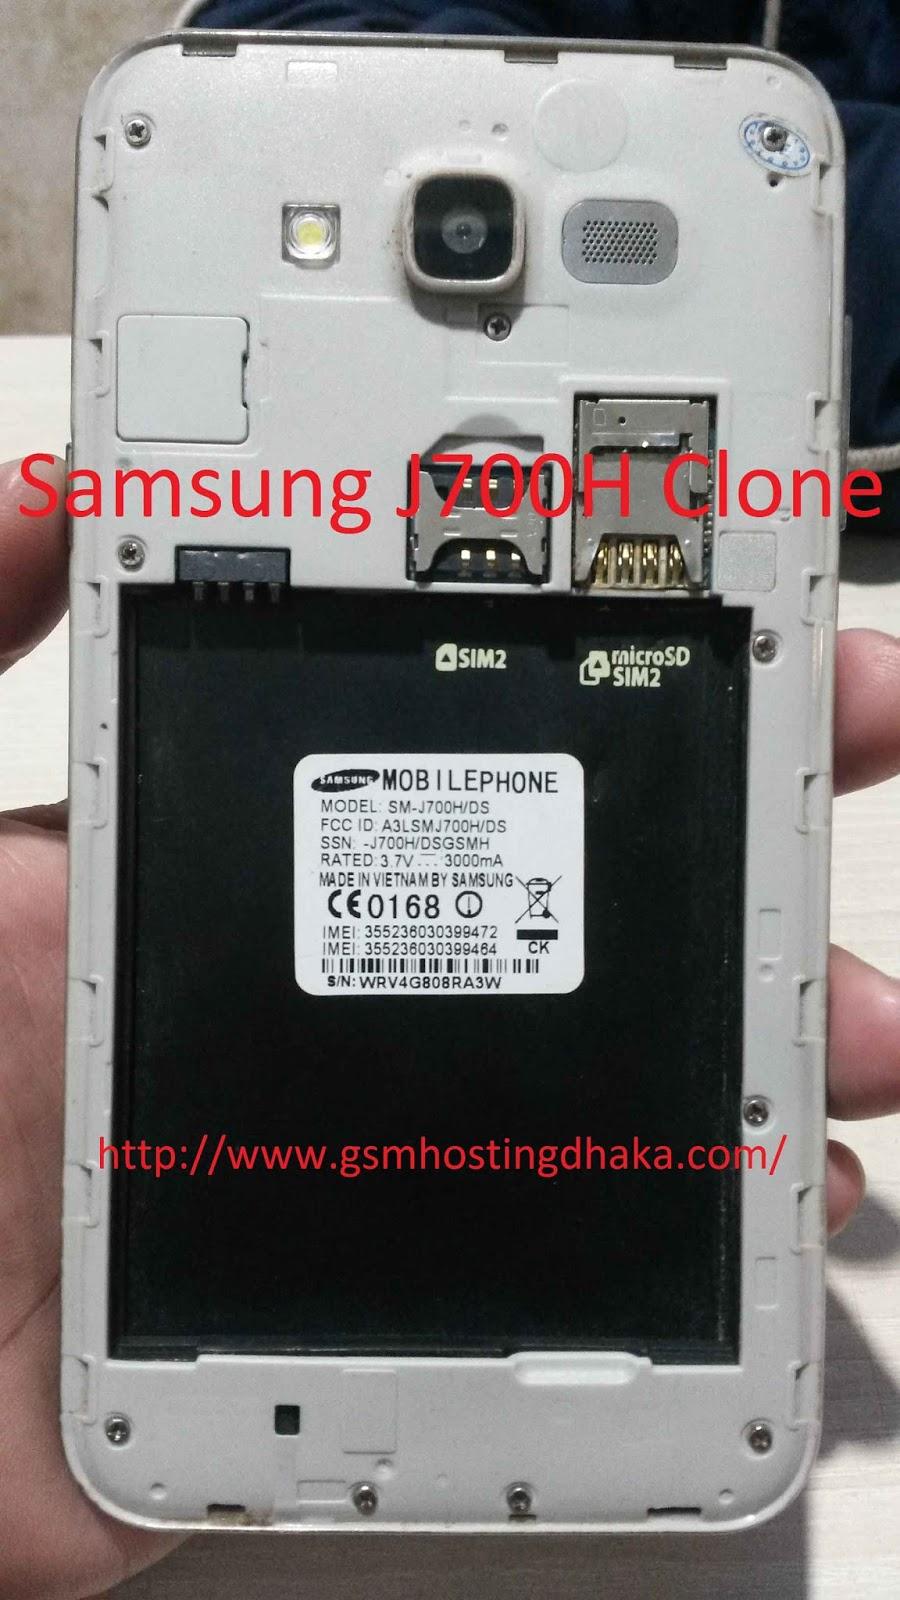 Samsung J7 (Sm-J700H) Clone Flash File| Free Download 100